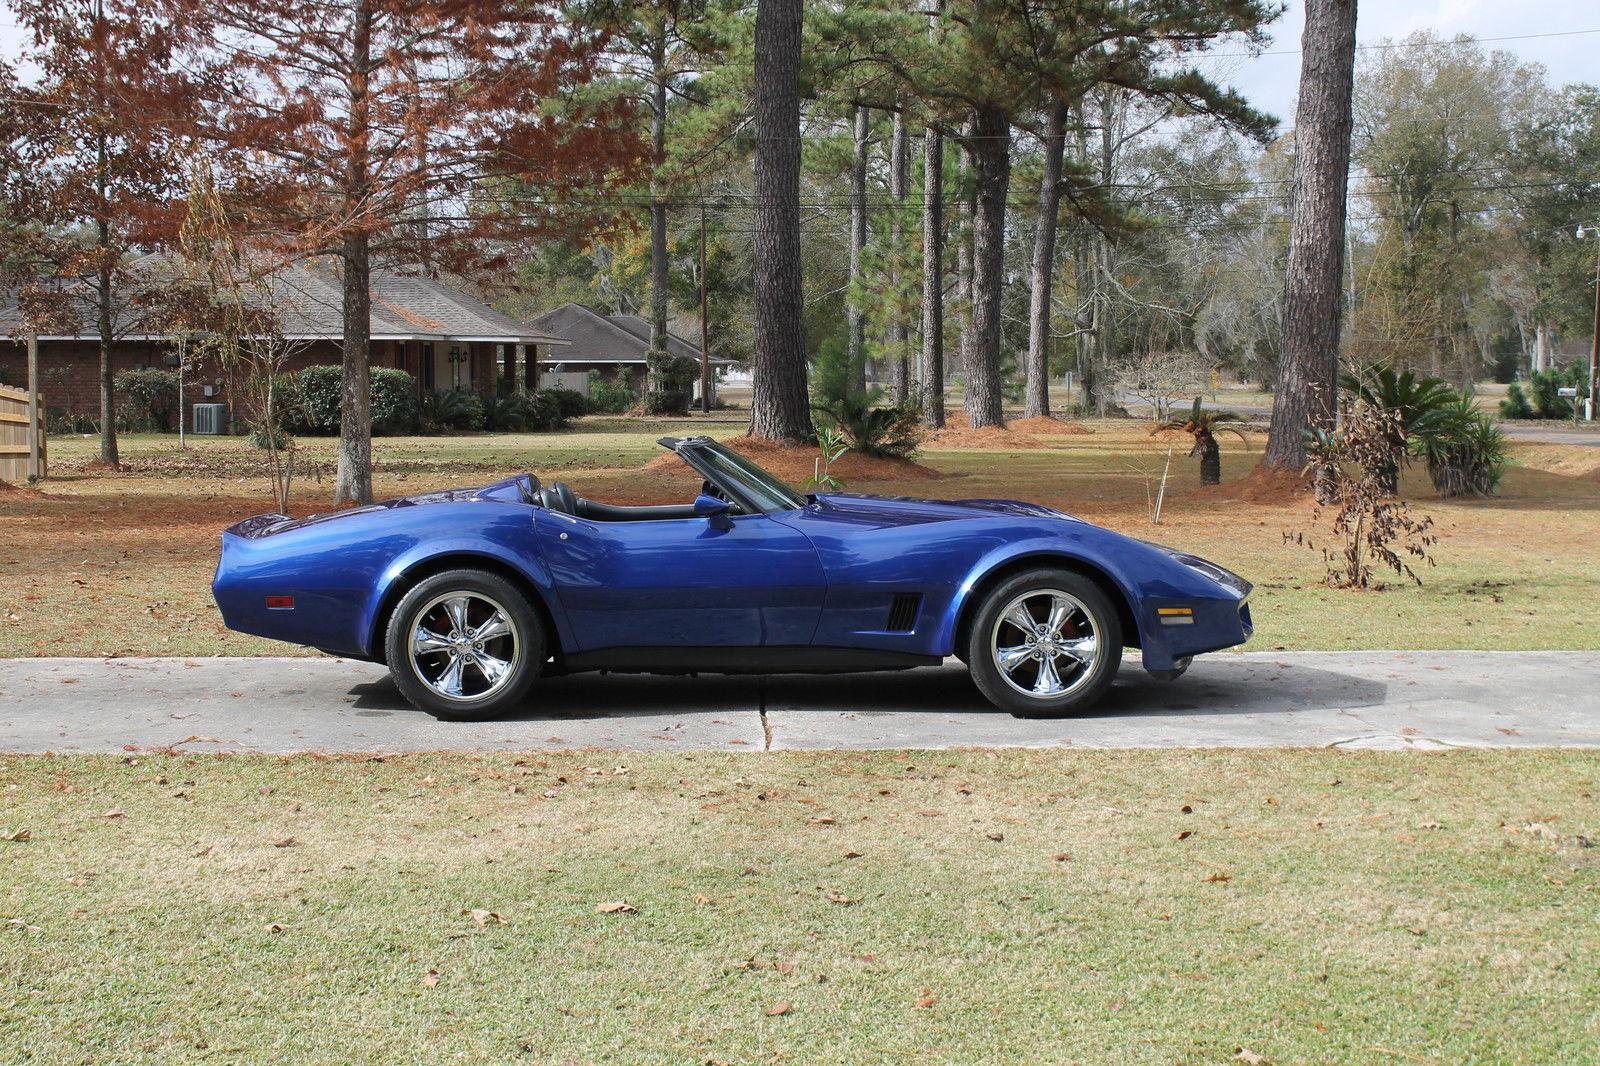 Cash For Cars Dallas >> 1980 Custom Corvette Convertible, one of a kind - Classic ...